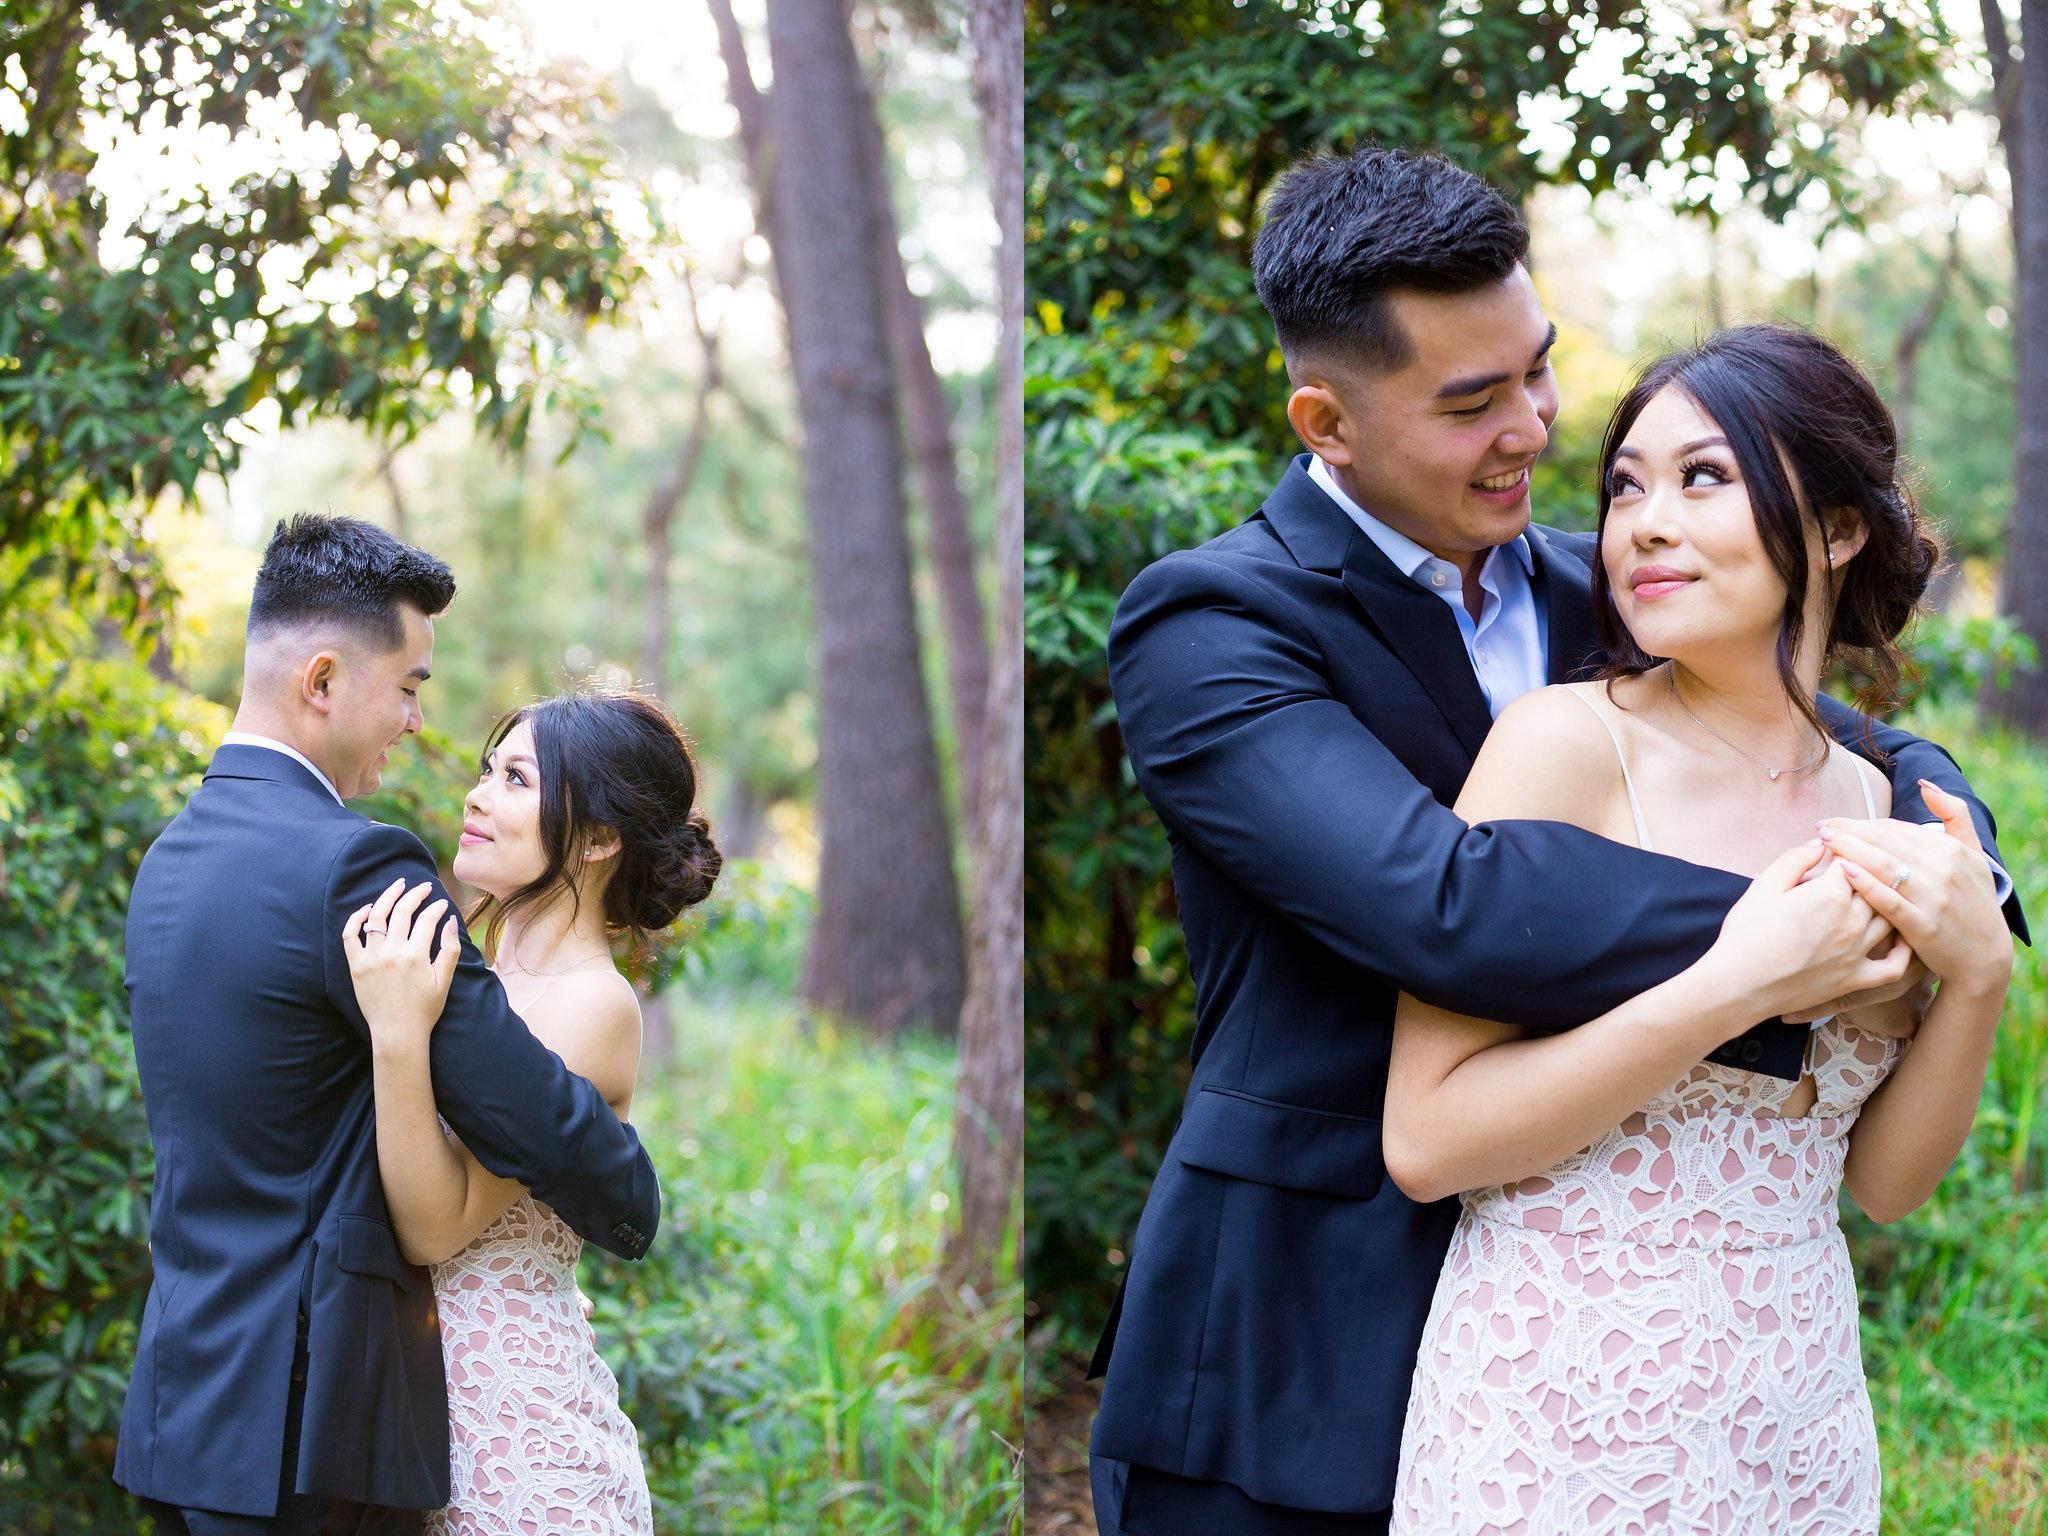 Sydney Professional Wedding Photographer - Asian Weddings - Jennifer Lam Photography - Centennial Parklands (4).jpg